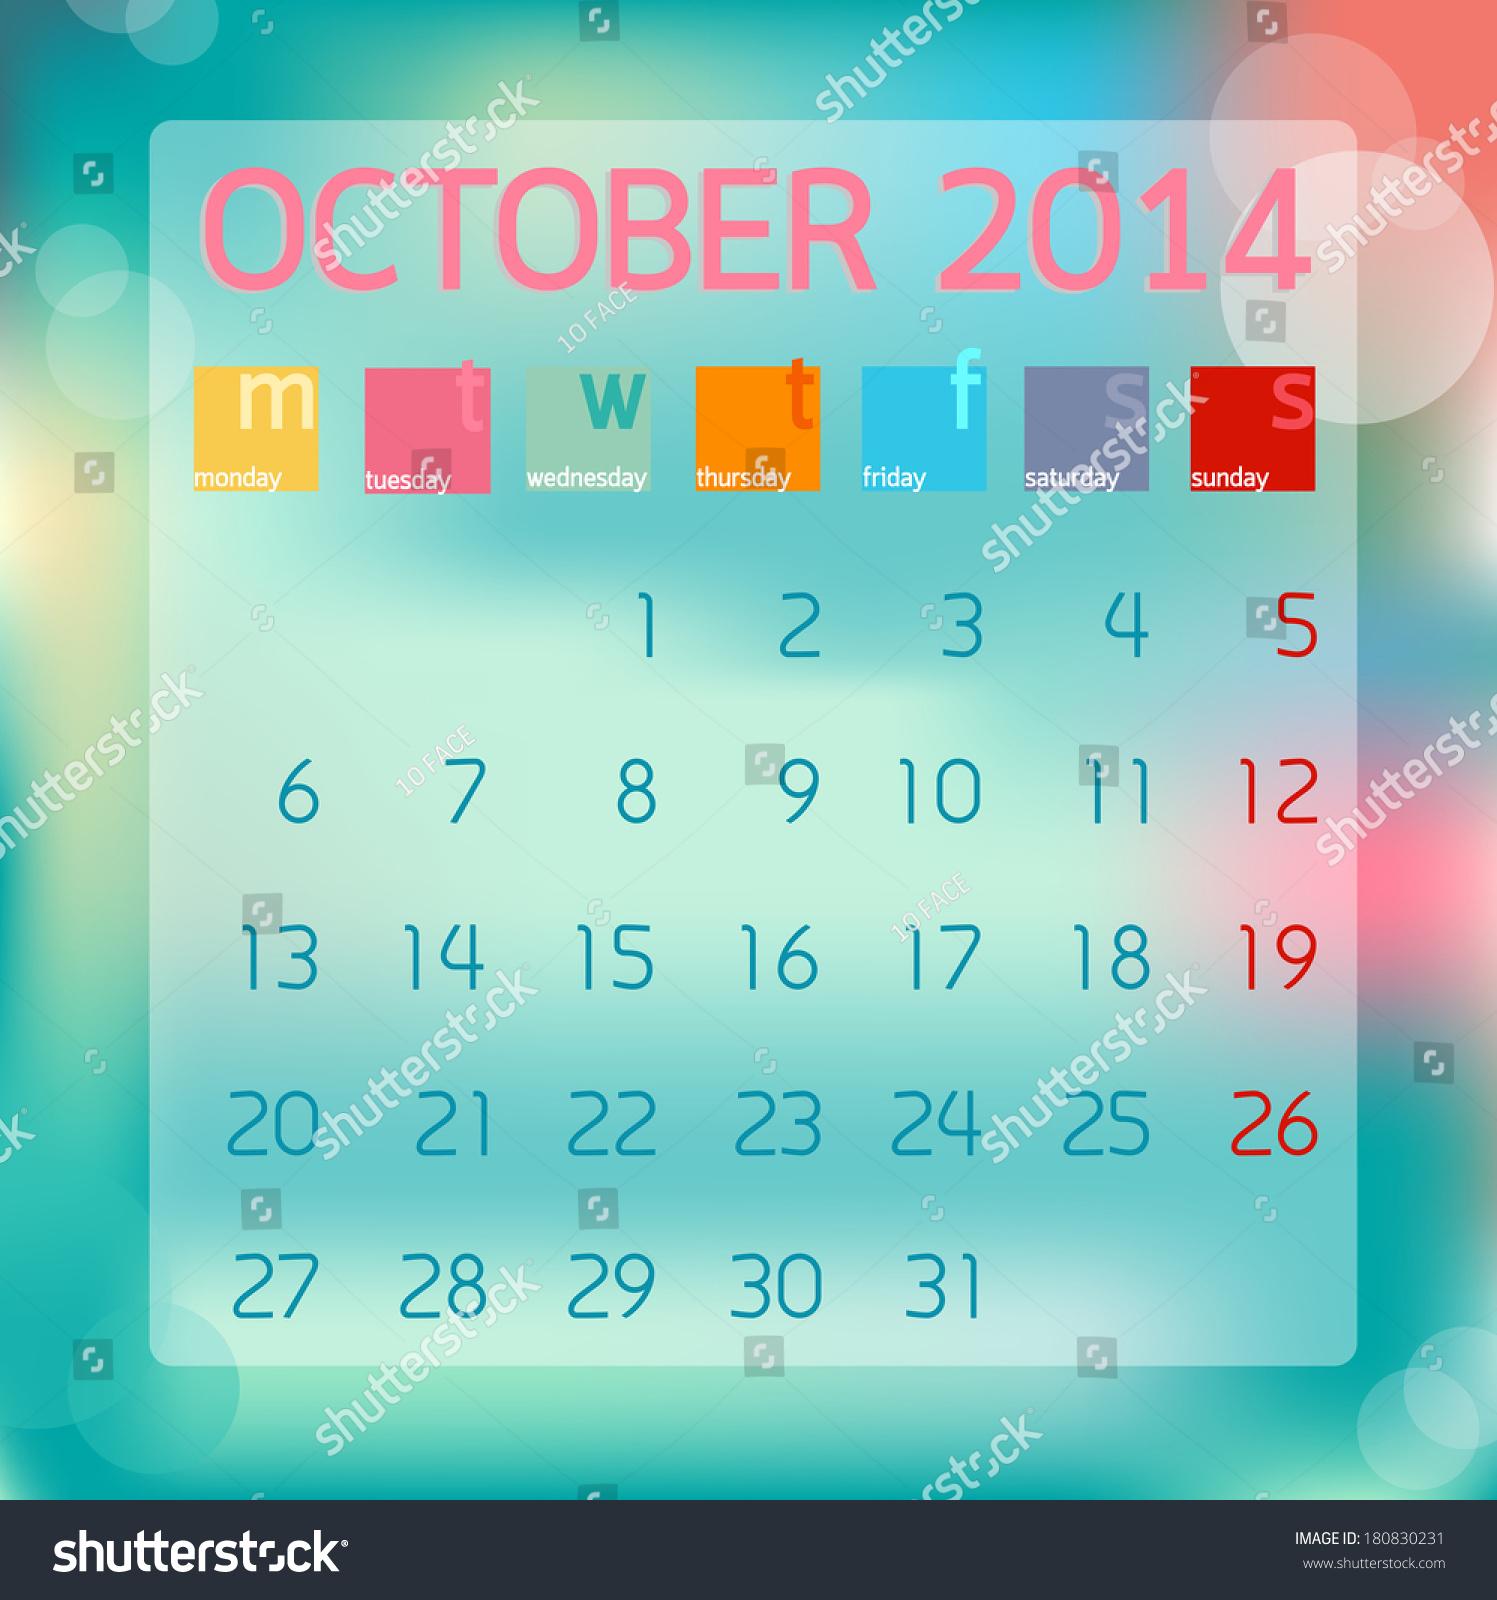 October Calendar Illustration : Calendar october flat style background stock vector